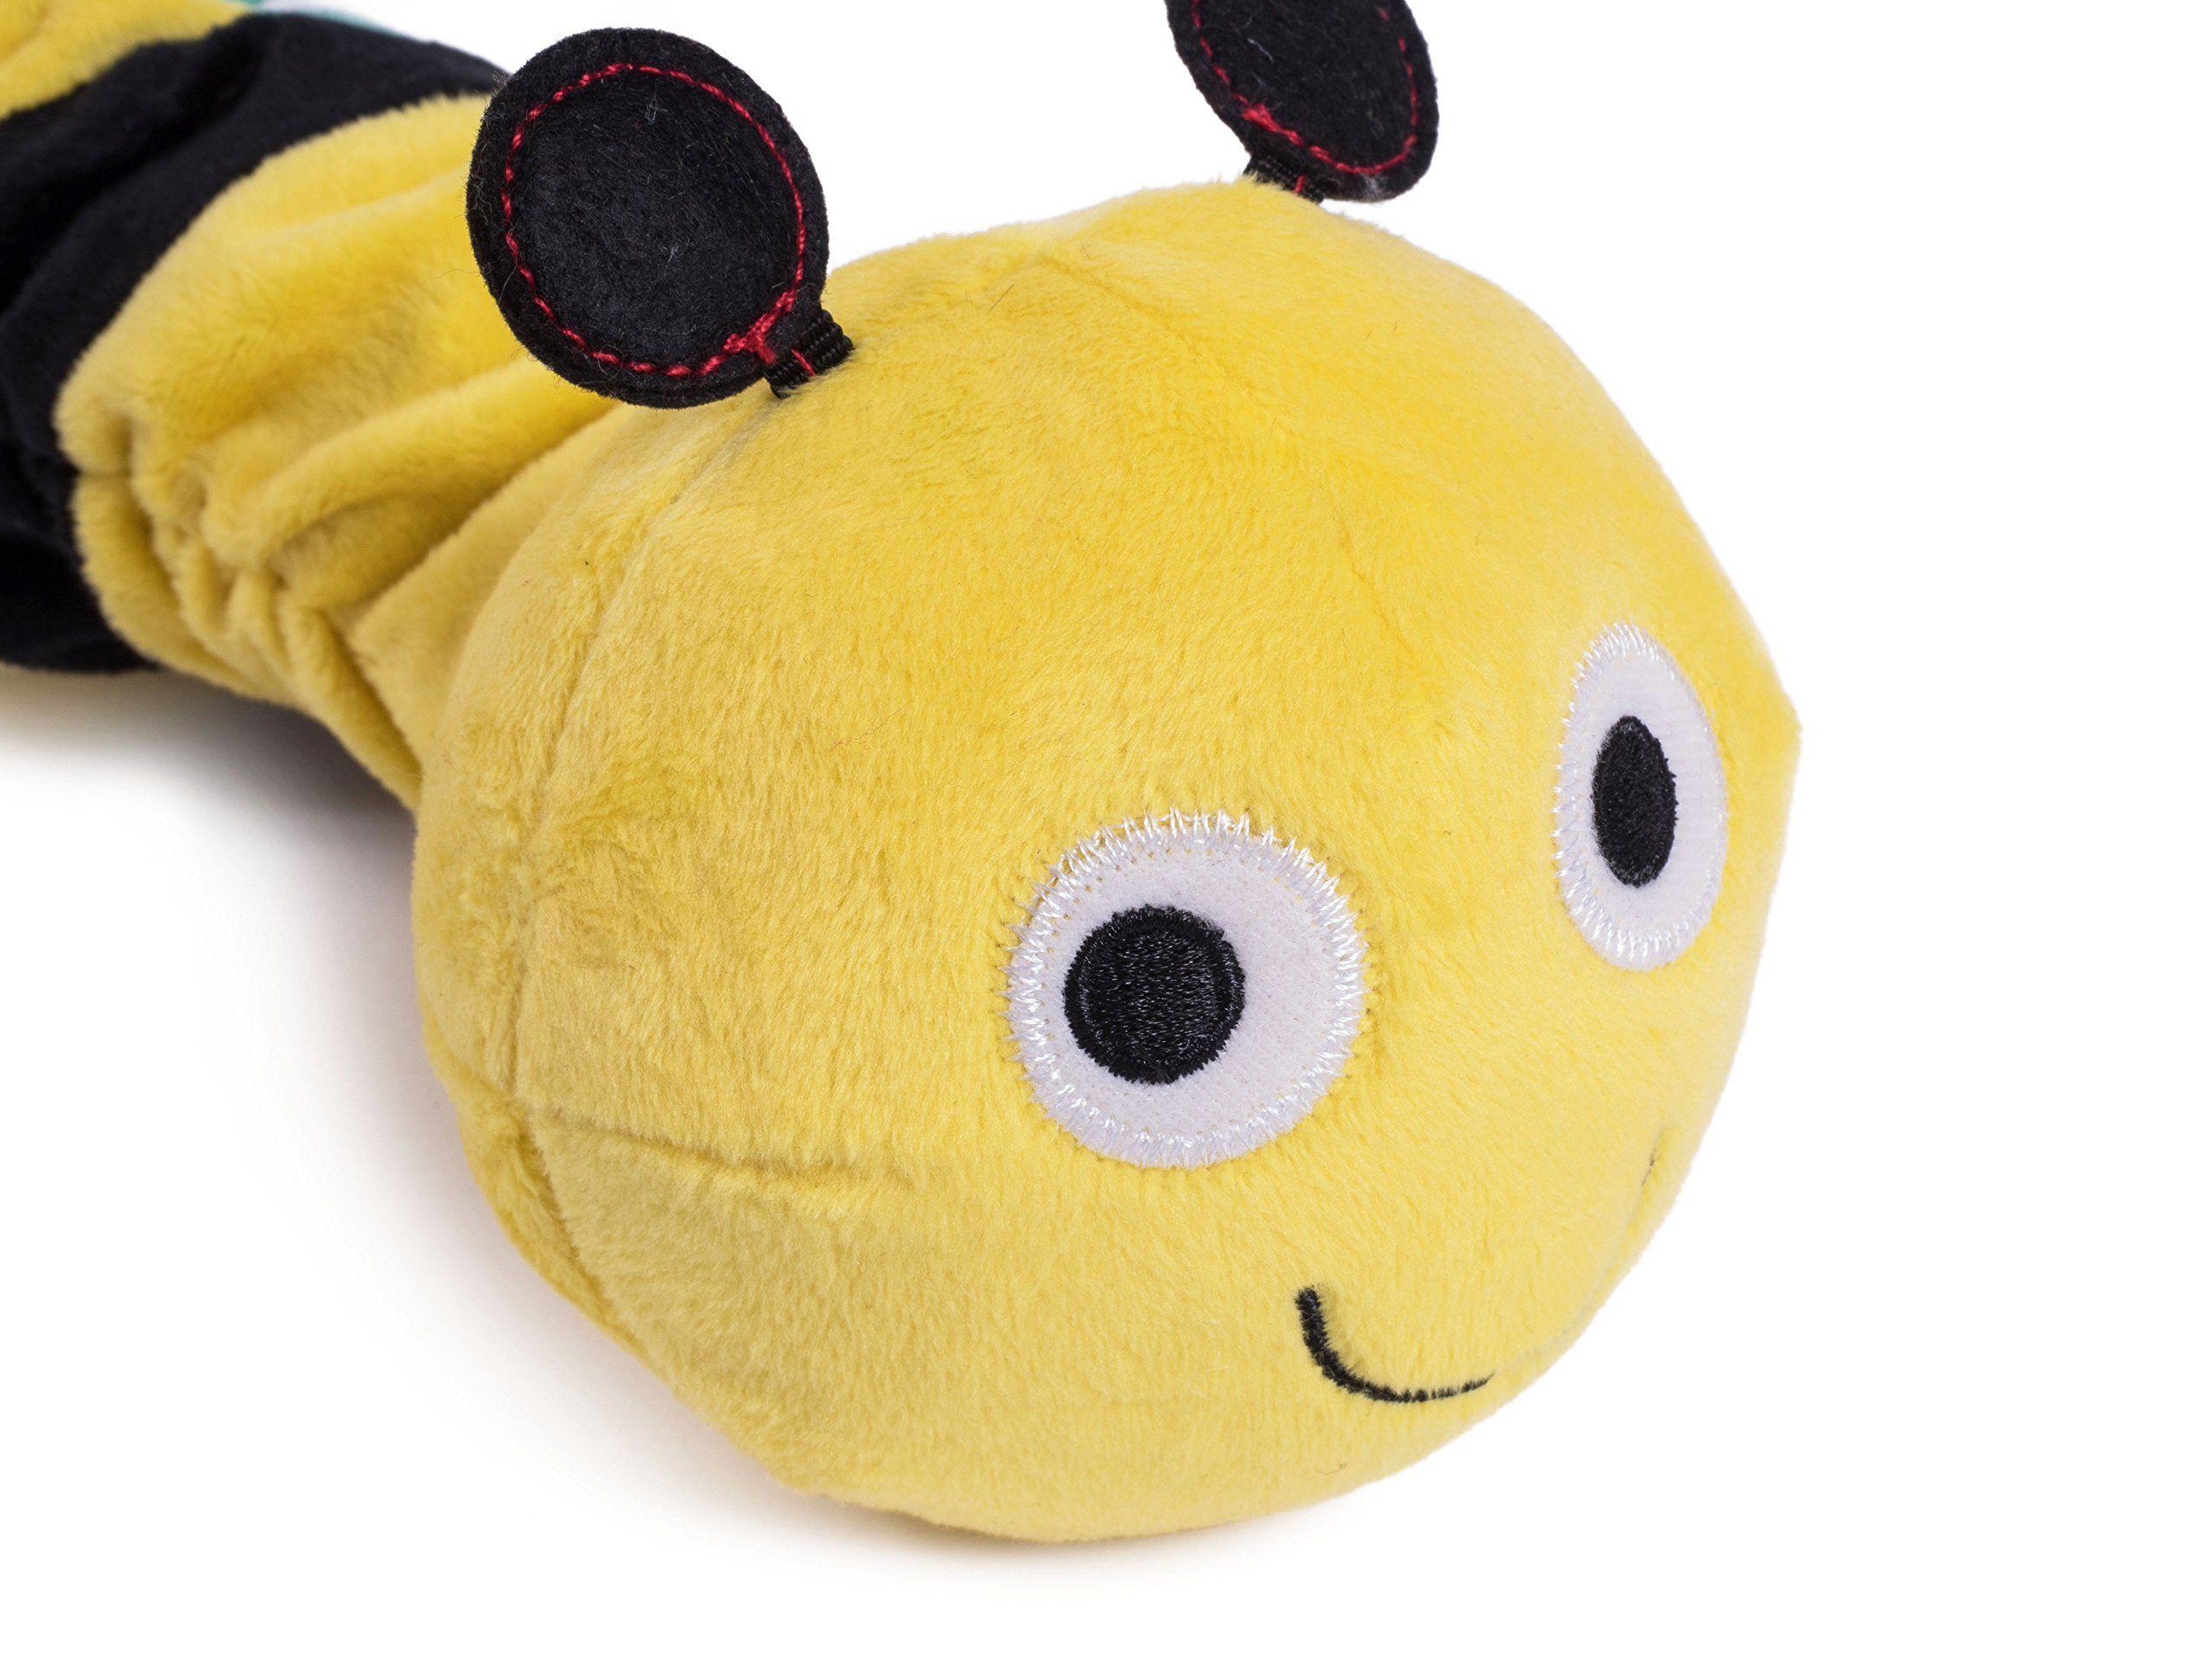 Petface Dog Toy Tough Plush Bert Bee Pet Squeaky Toy Desire To